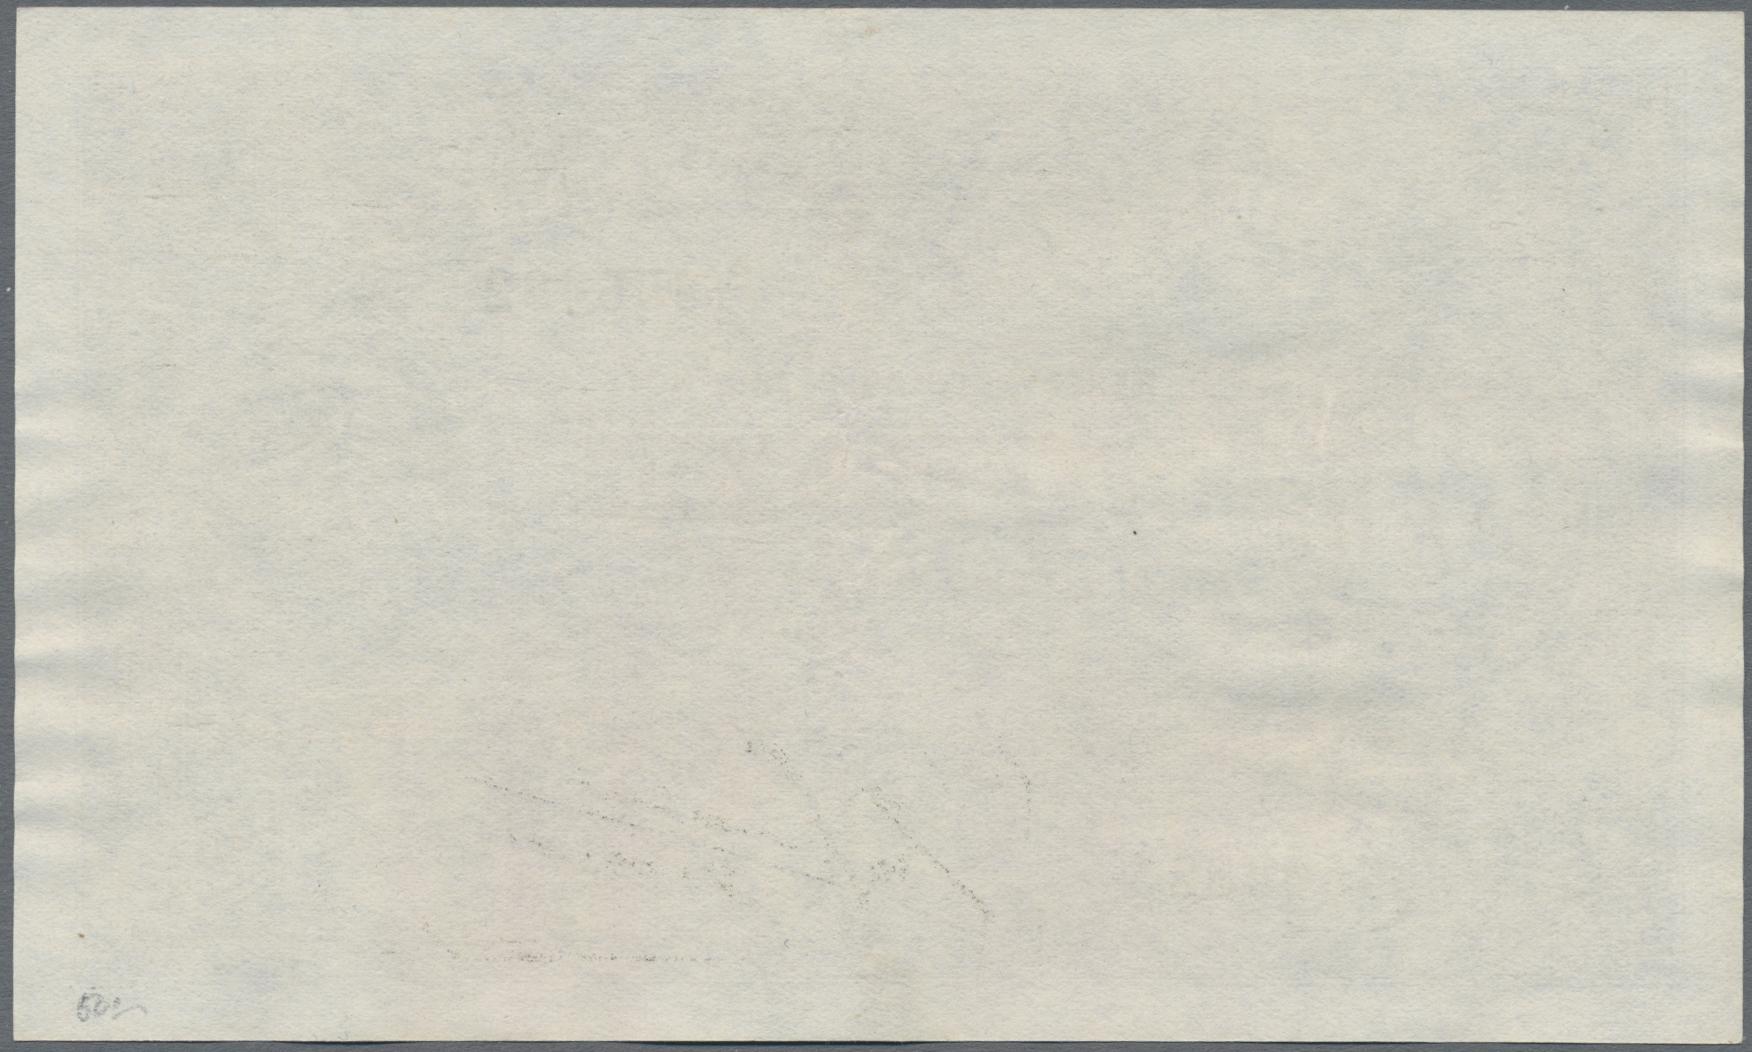 Lot 00520 - Malta | Banknoten  -  Auktionshaus Christoph Gärtner GmbH & Co. KG Sale #48 The Banknotes